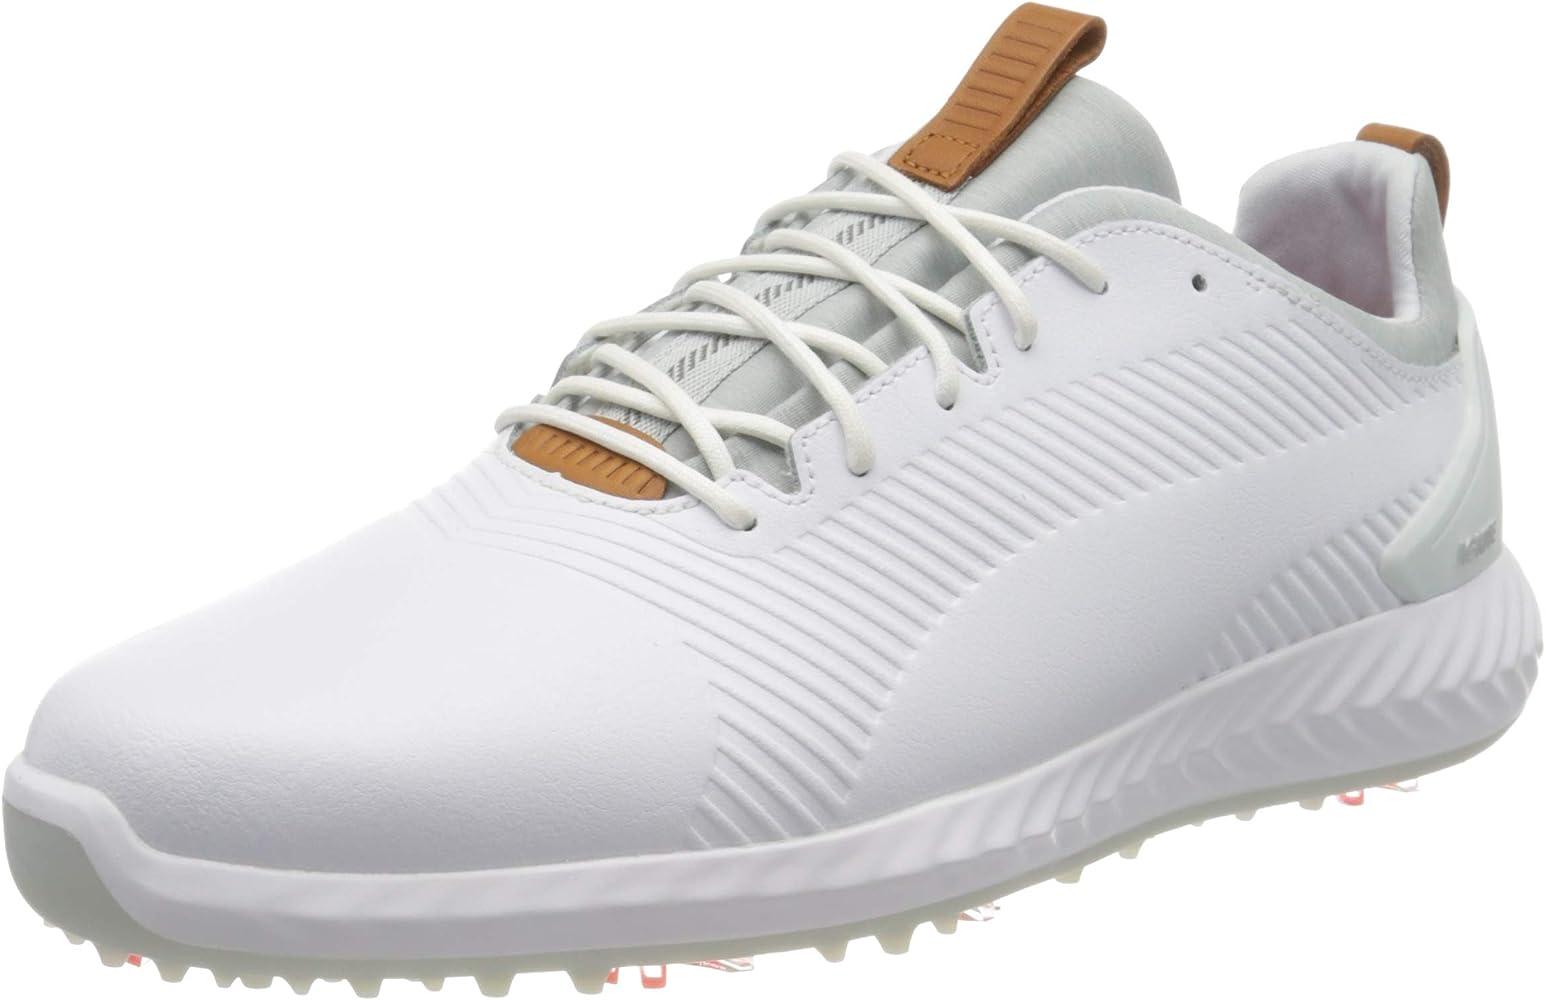 Puma Golf Men's Ignite Pwradapt Leather 2.0 Golf Shoe